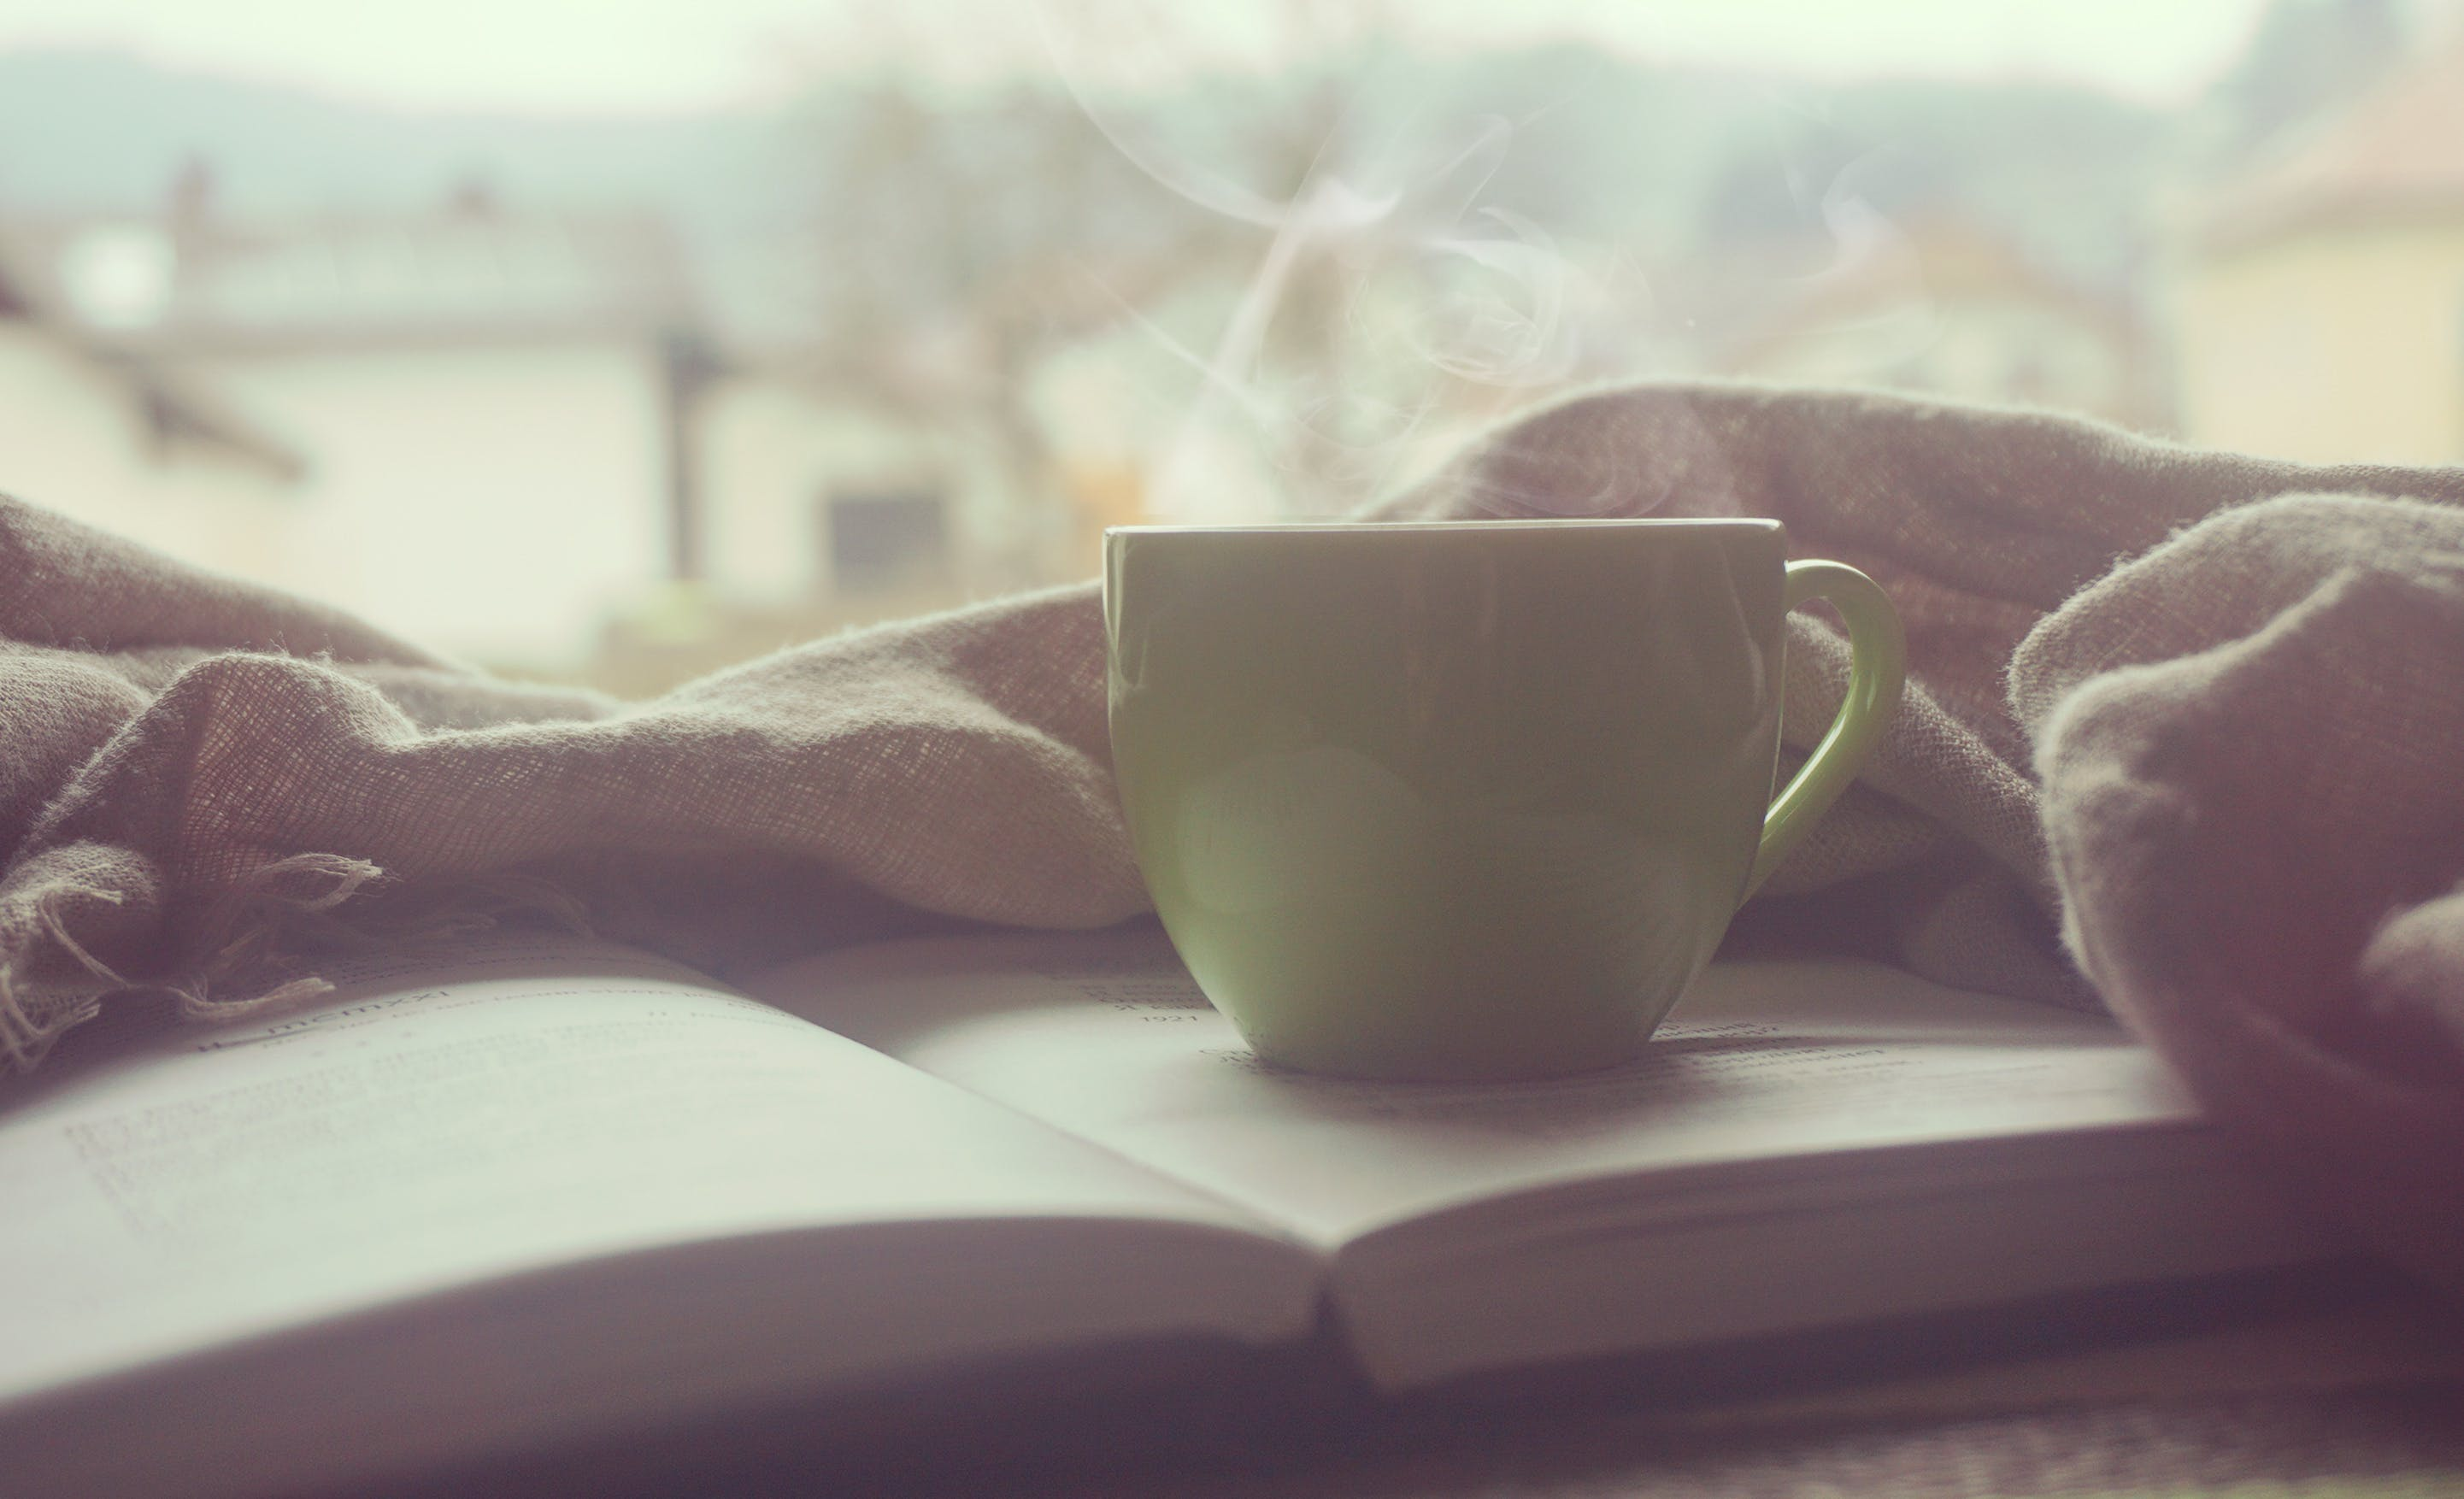 Kostenloses Stock Foto zu bibel, buch, frühstück, kaffee